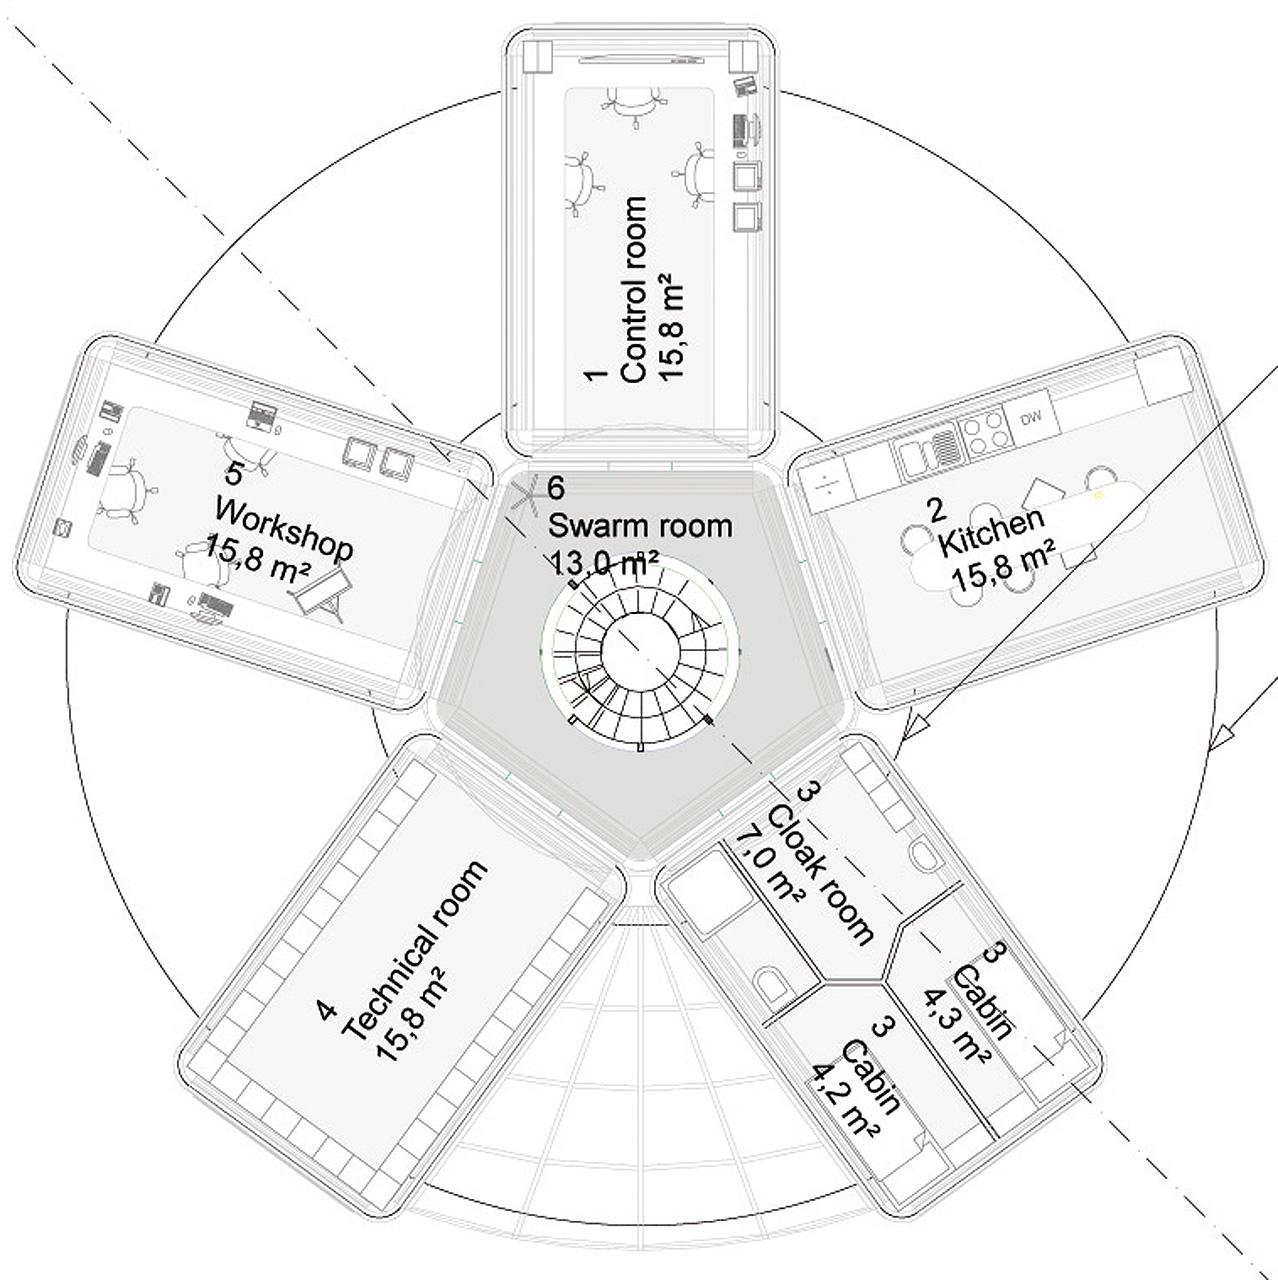 arkitektur_trondheim_sintef_ntnu_design_act_modul_eu_prosjekt_kontorer_verksted_plan_planlosning_plantegning